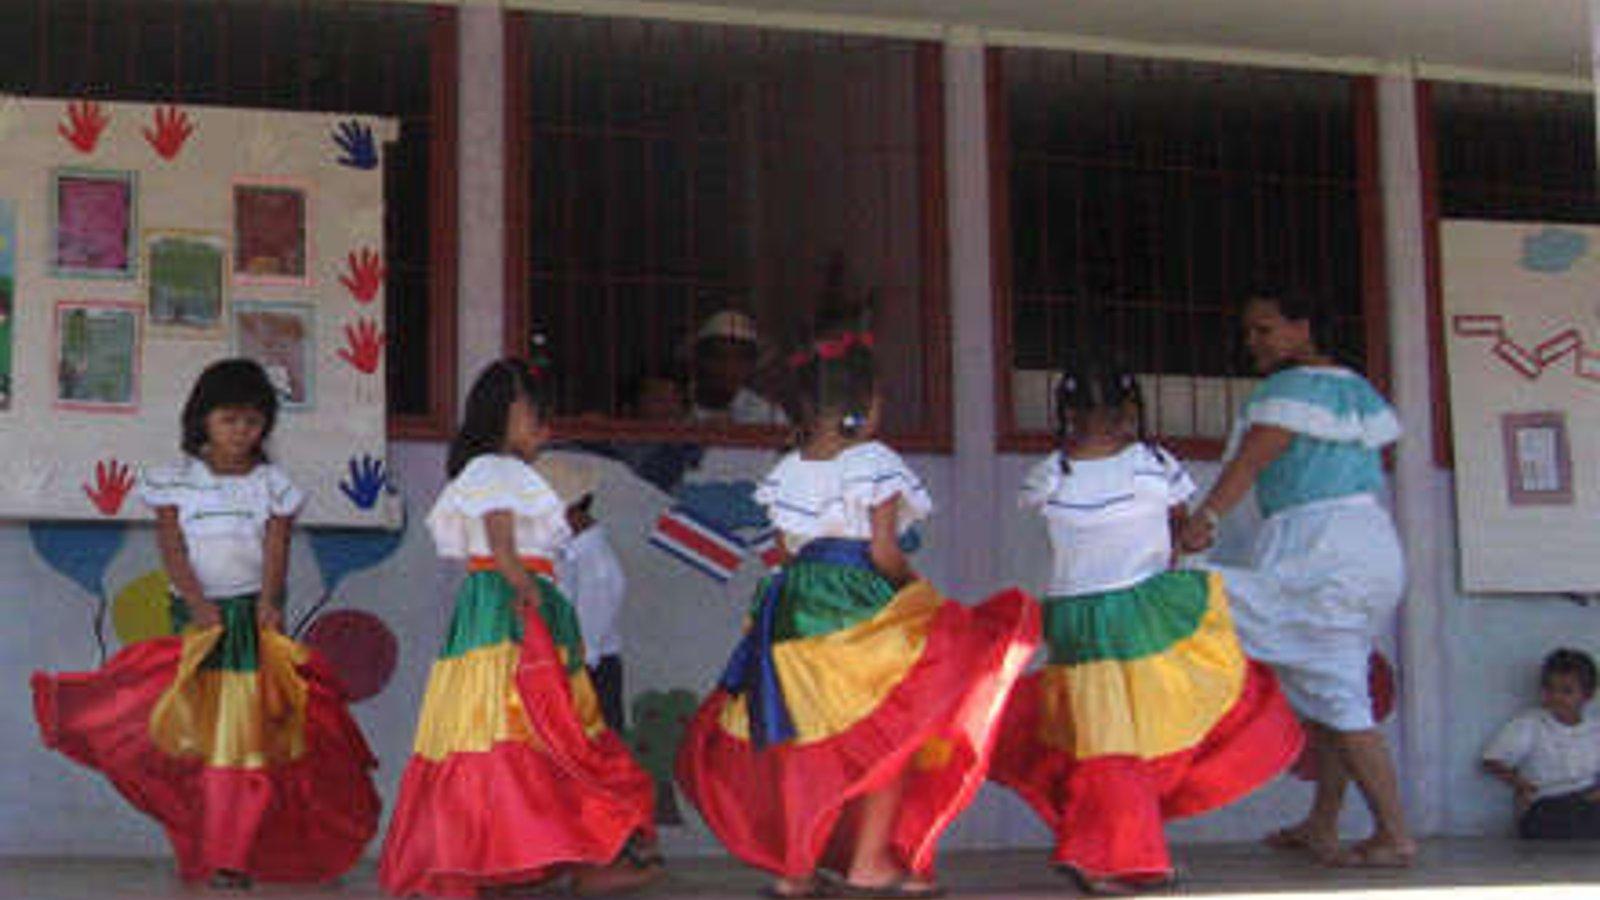 Paths of Hope - Livelihoods in Three Caribbean Communities of Costa Rica